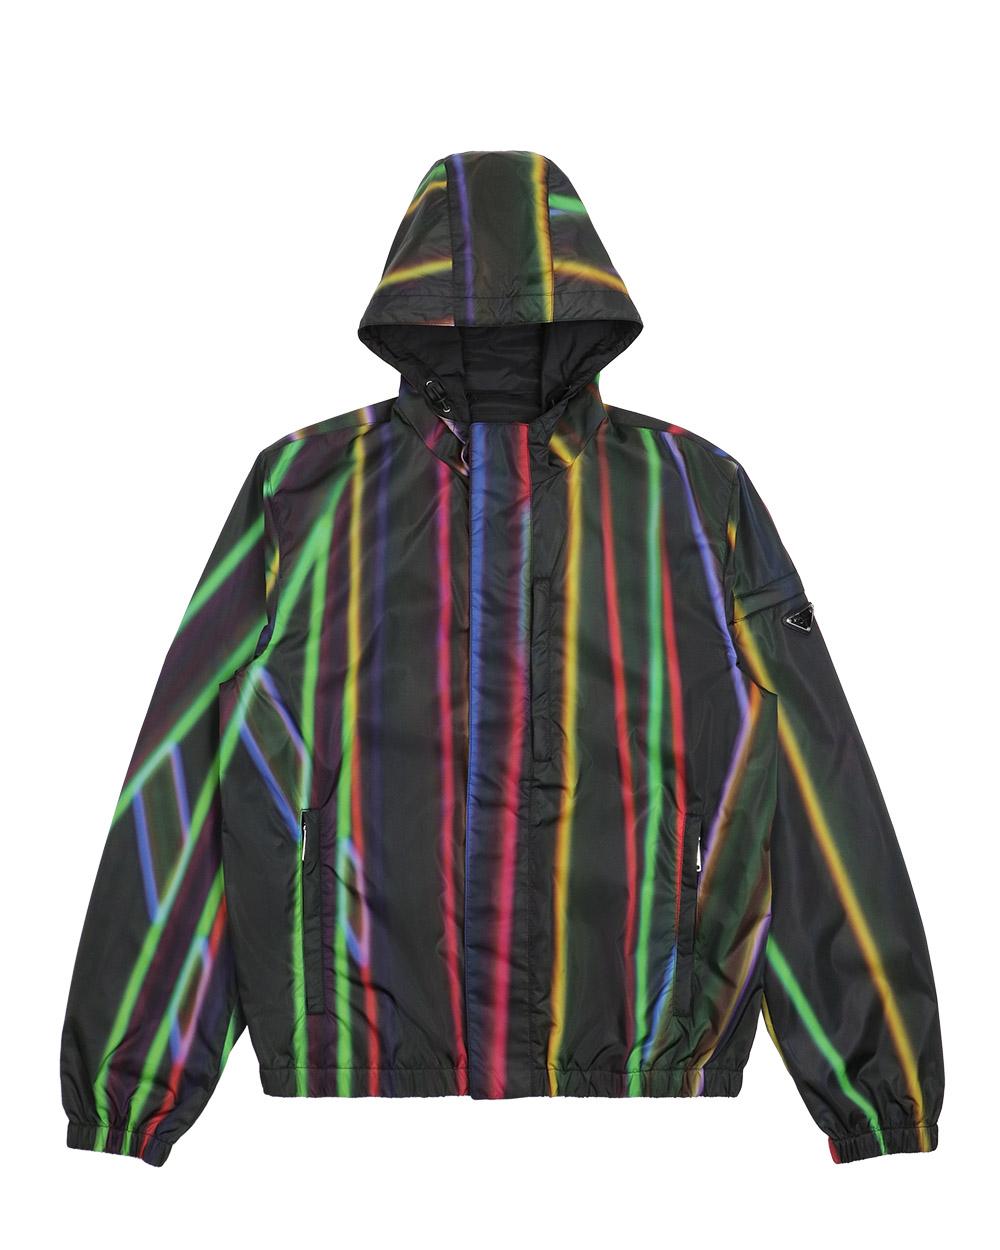 Black & Multicolor Hooded Zip Jacket SGN5221P61